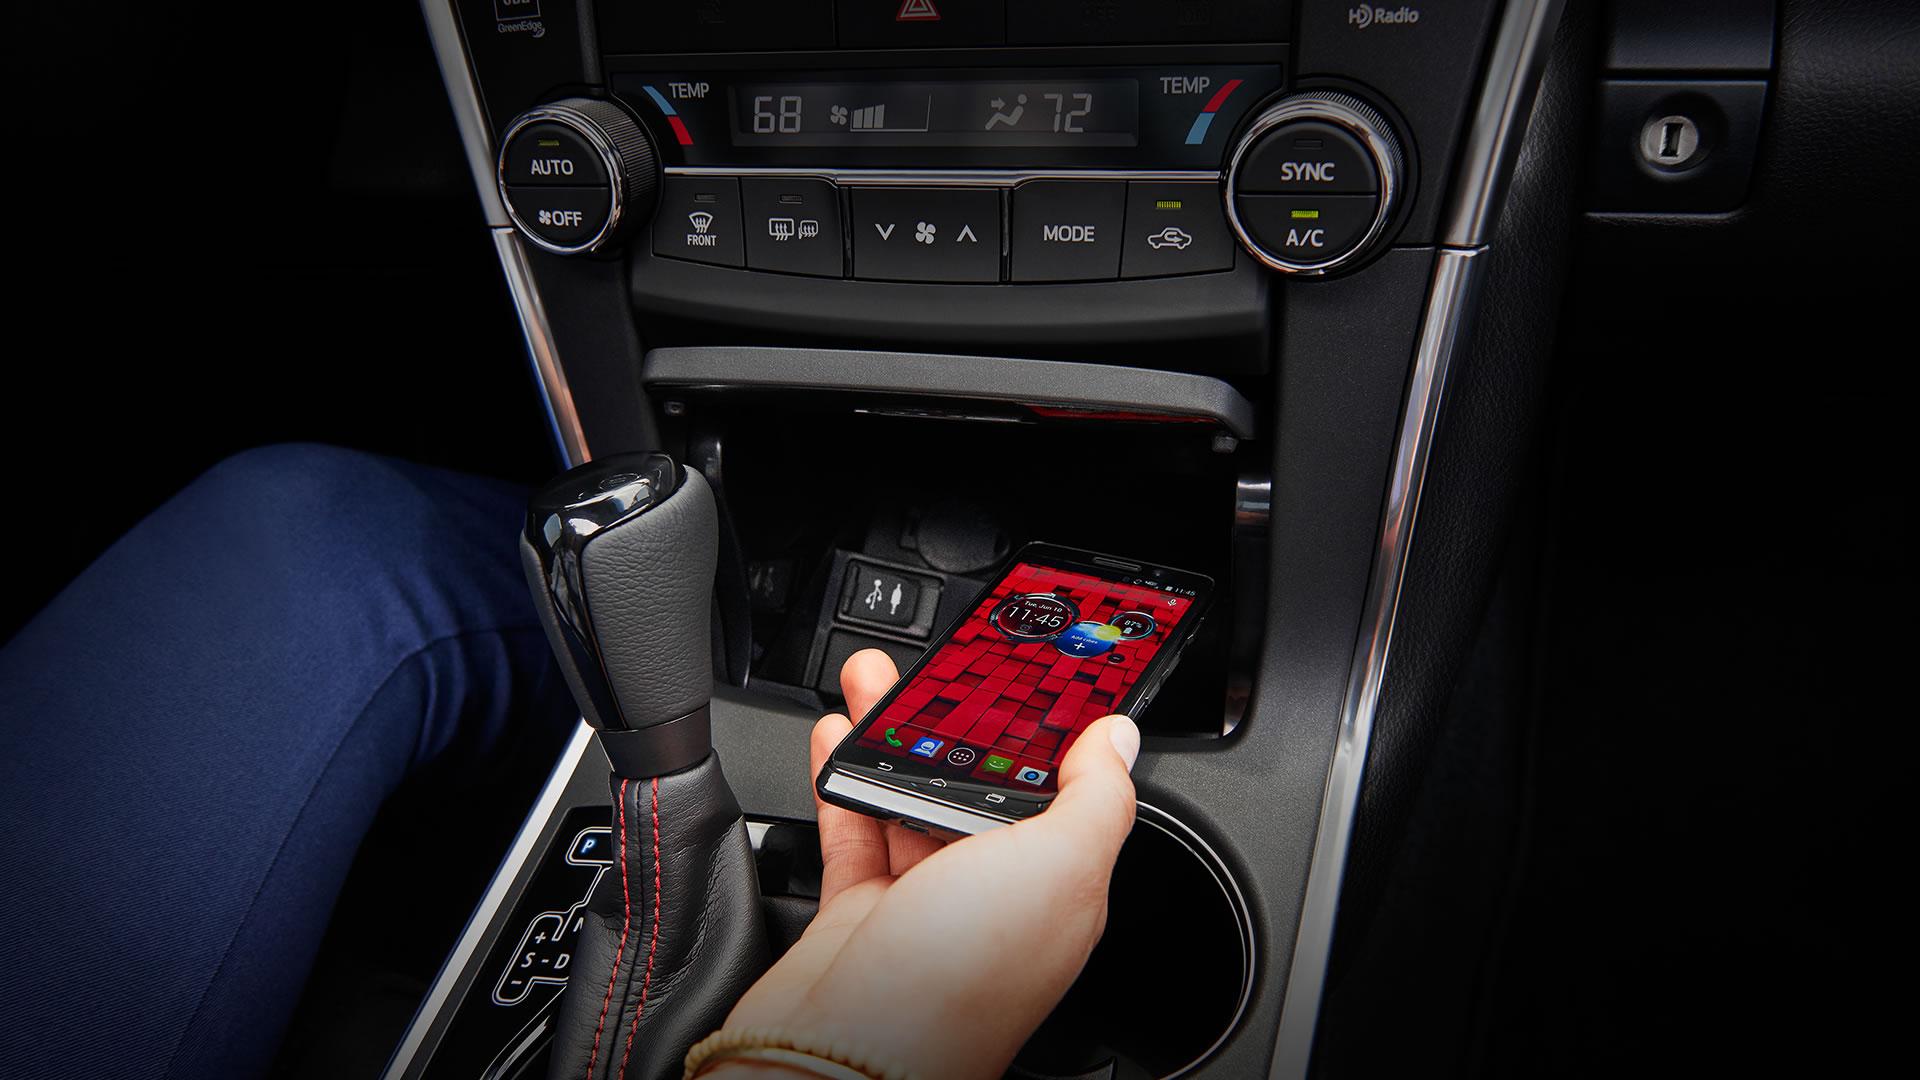 2017 Toyota Camry Interior Lightbox